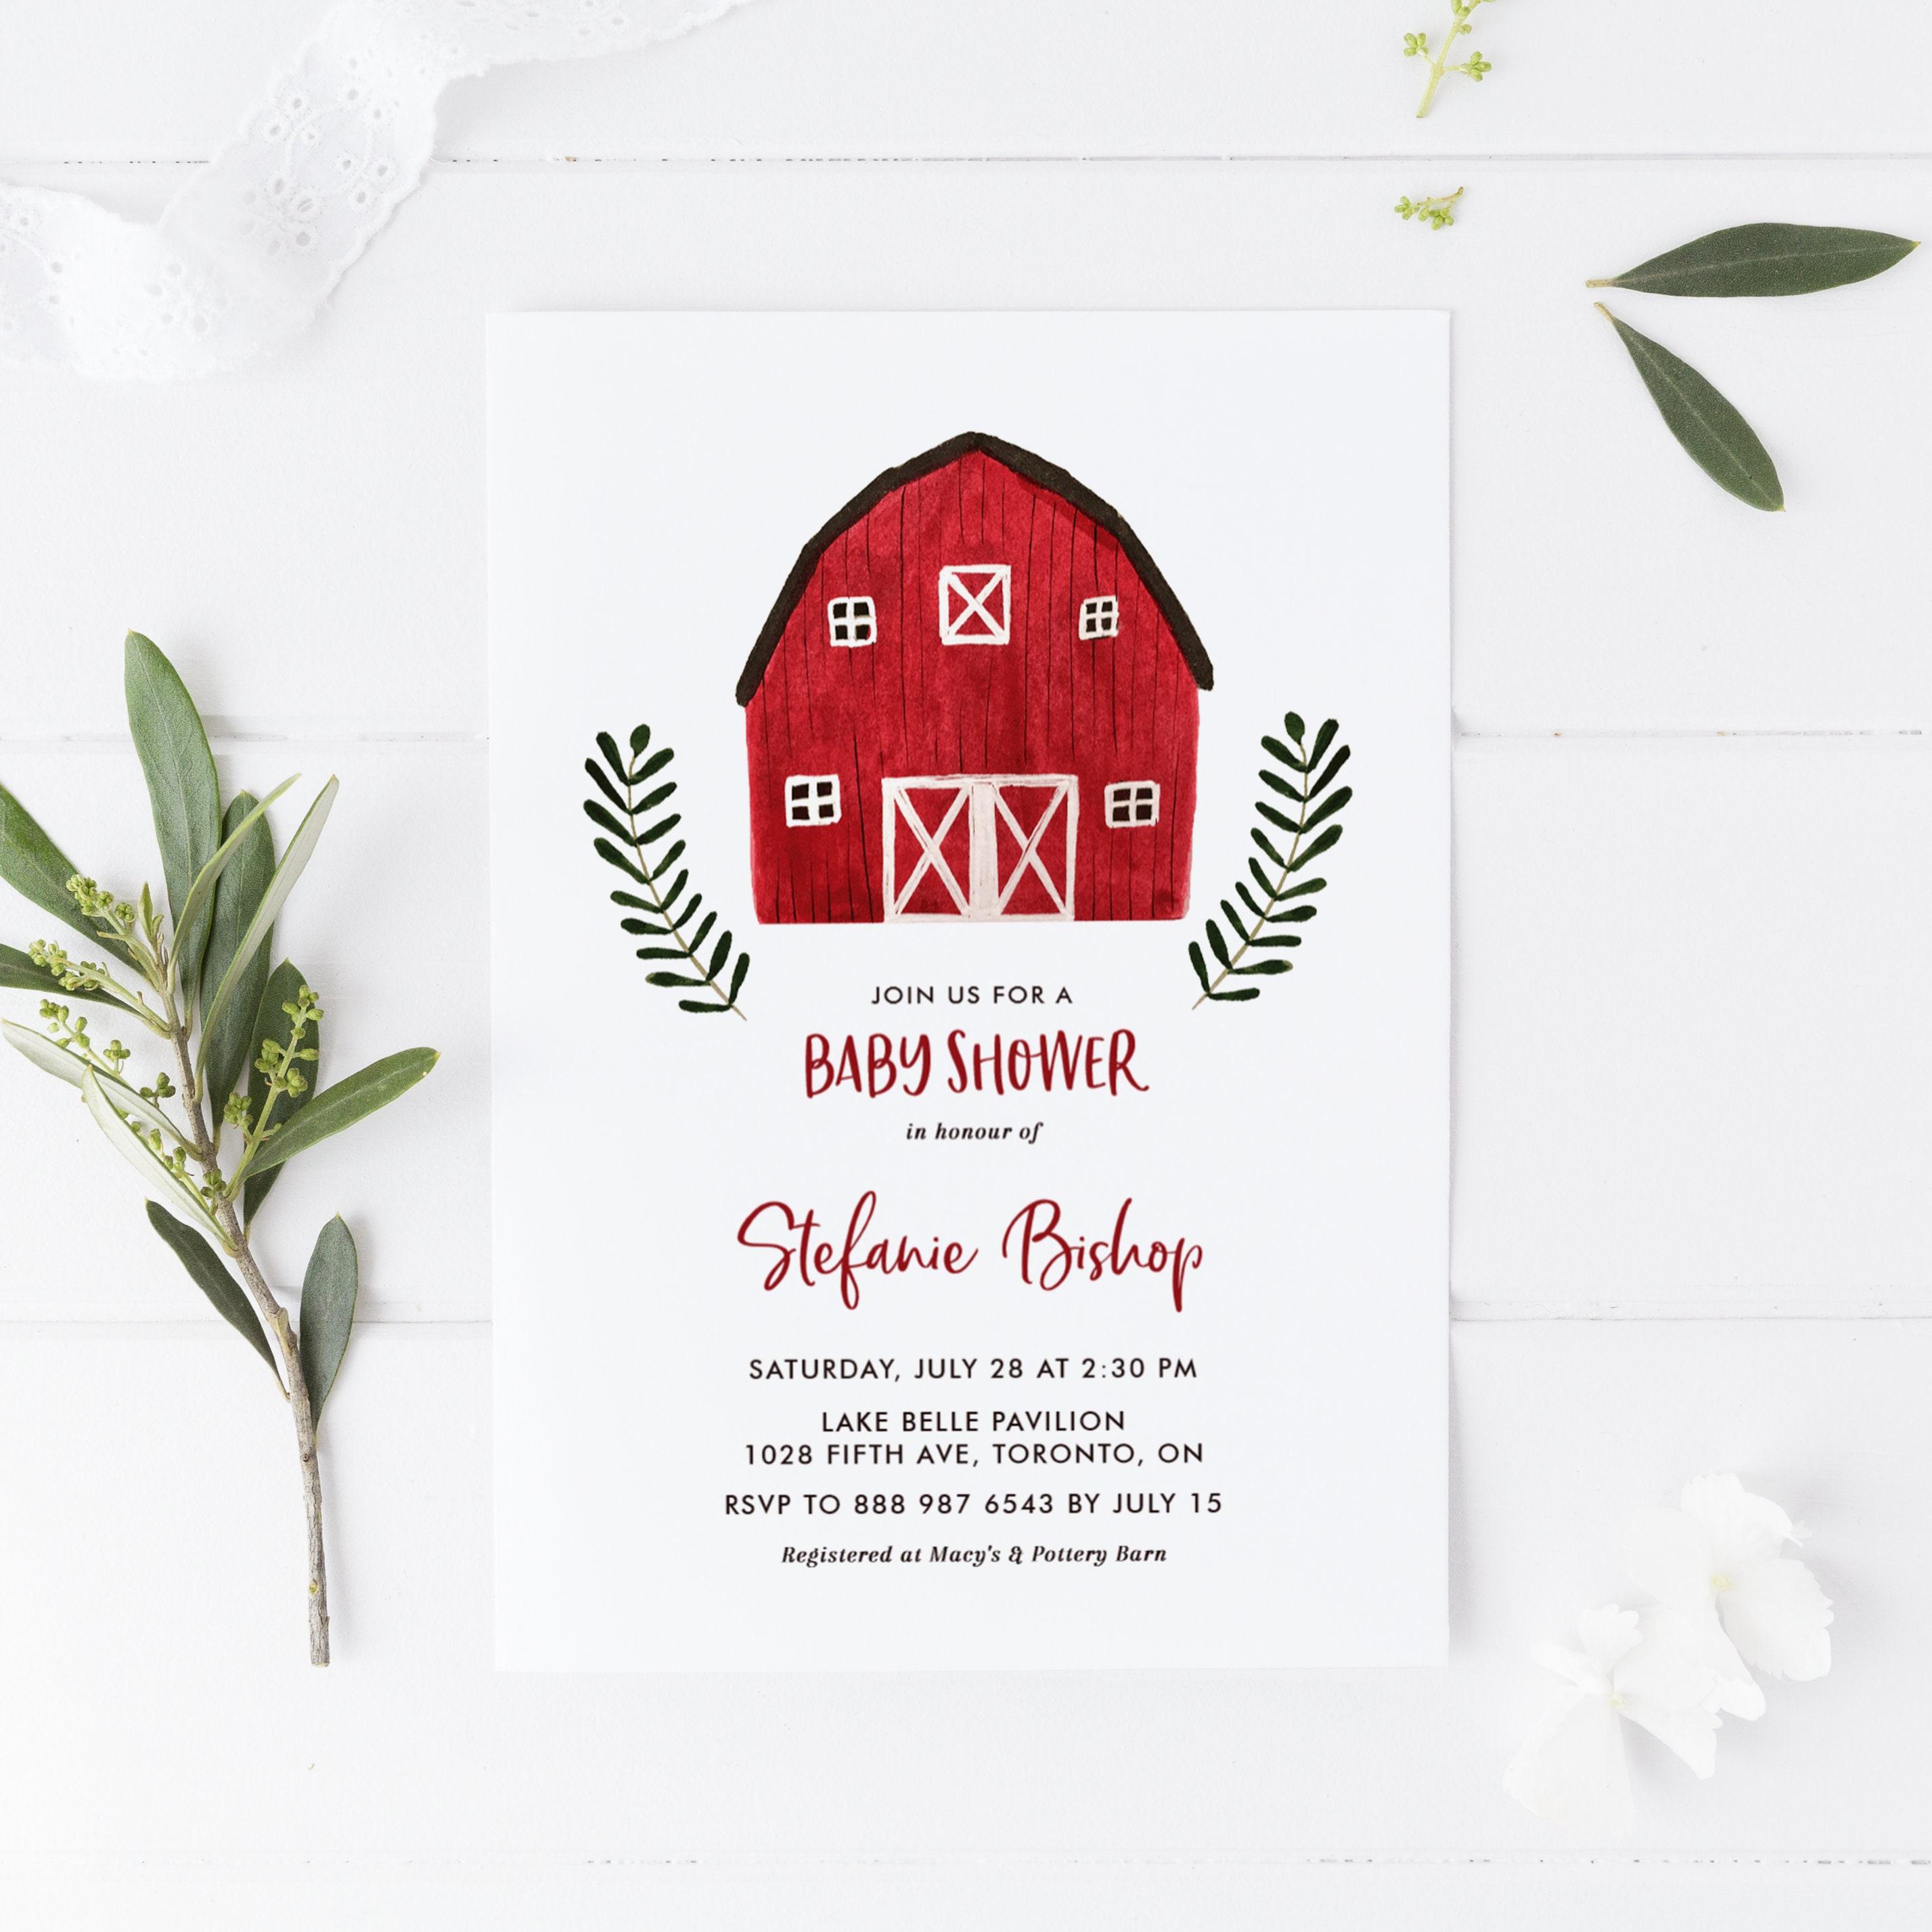 Editable Rustic Baby Shower Invitation Template - Printable Watercolor Red  Farmhouse Invitation - Barnyard Baby Shower Invitation